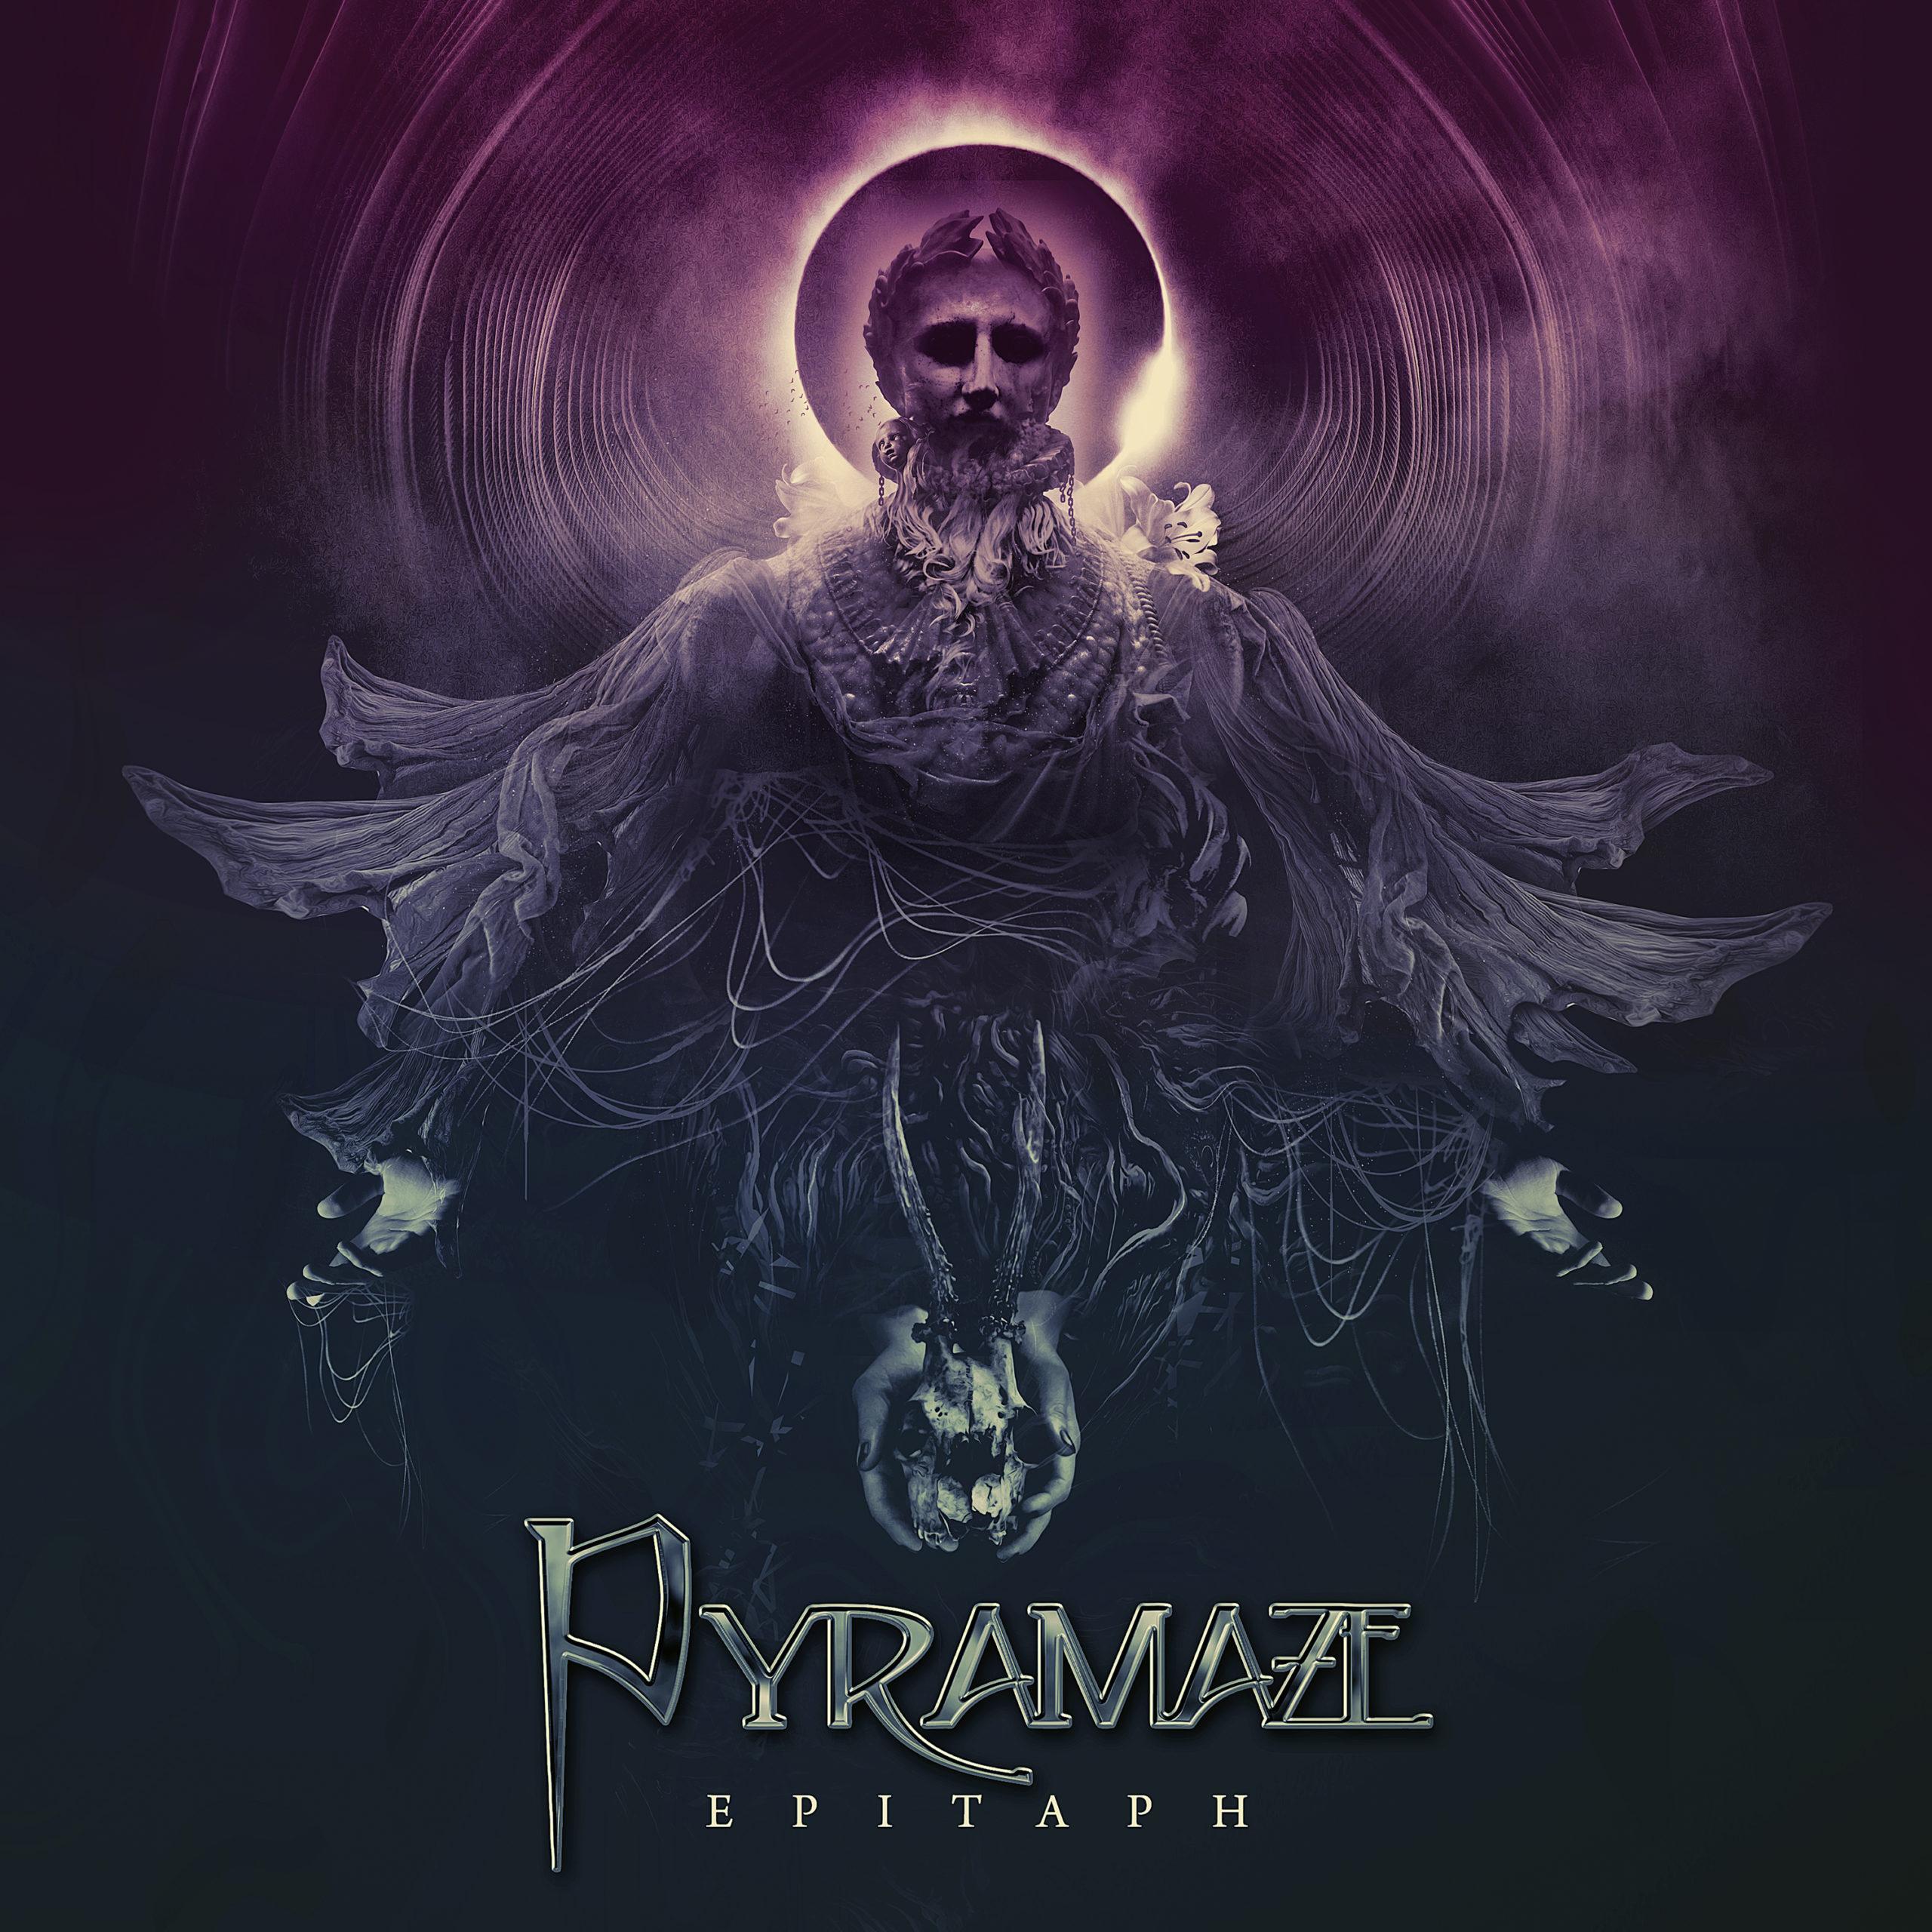 Pyramaze: Epitaph